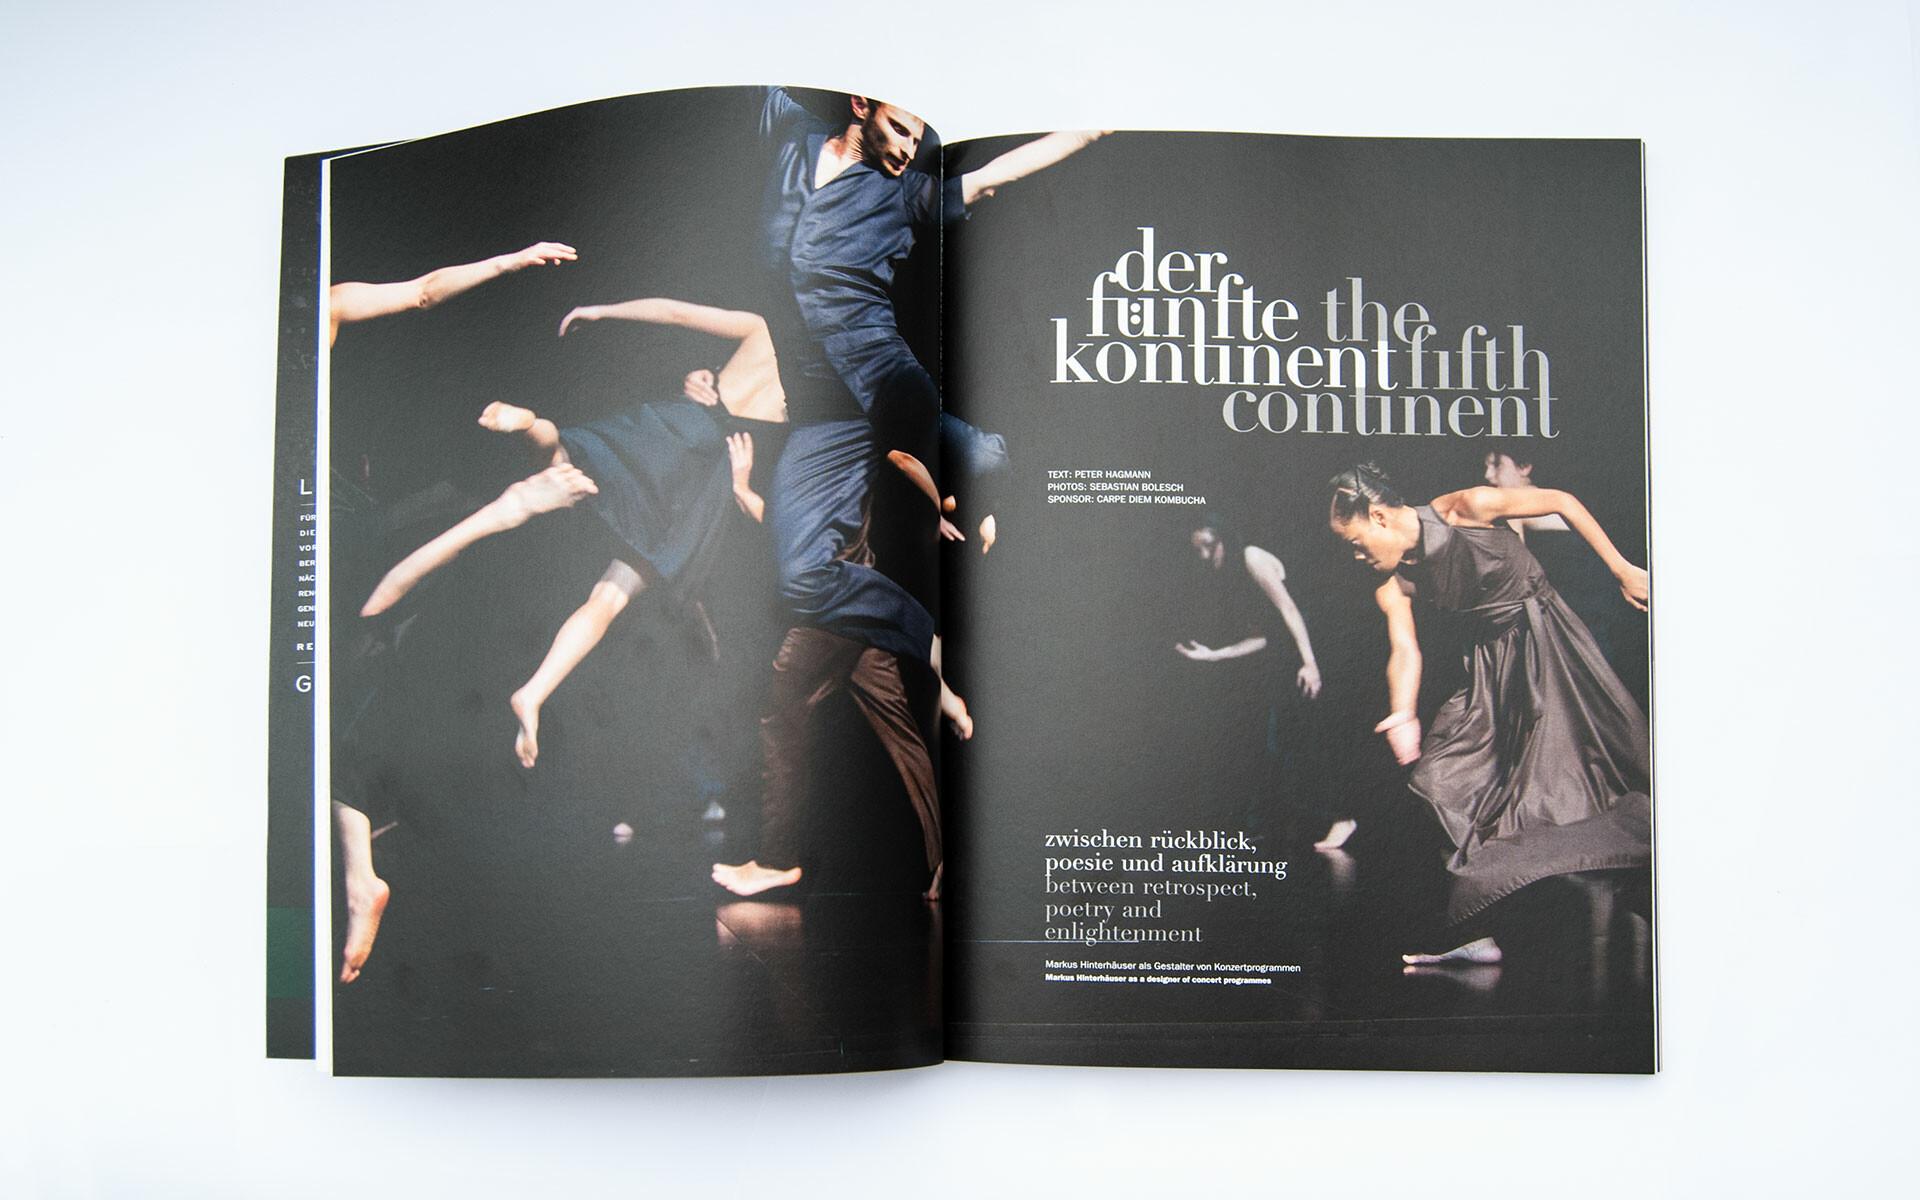 Salon 2011 – fifth continent